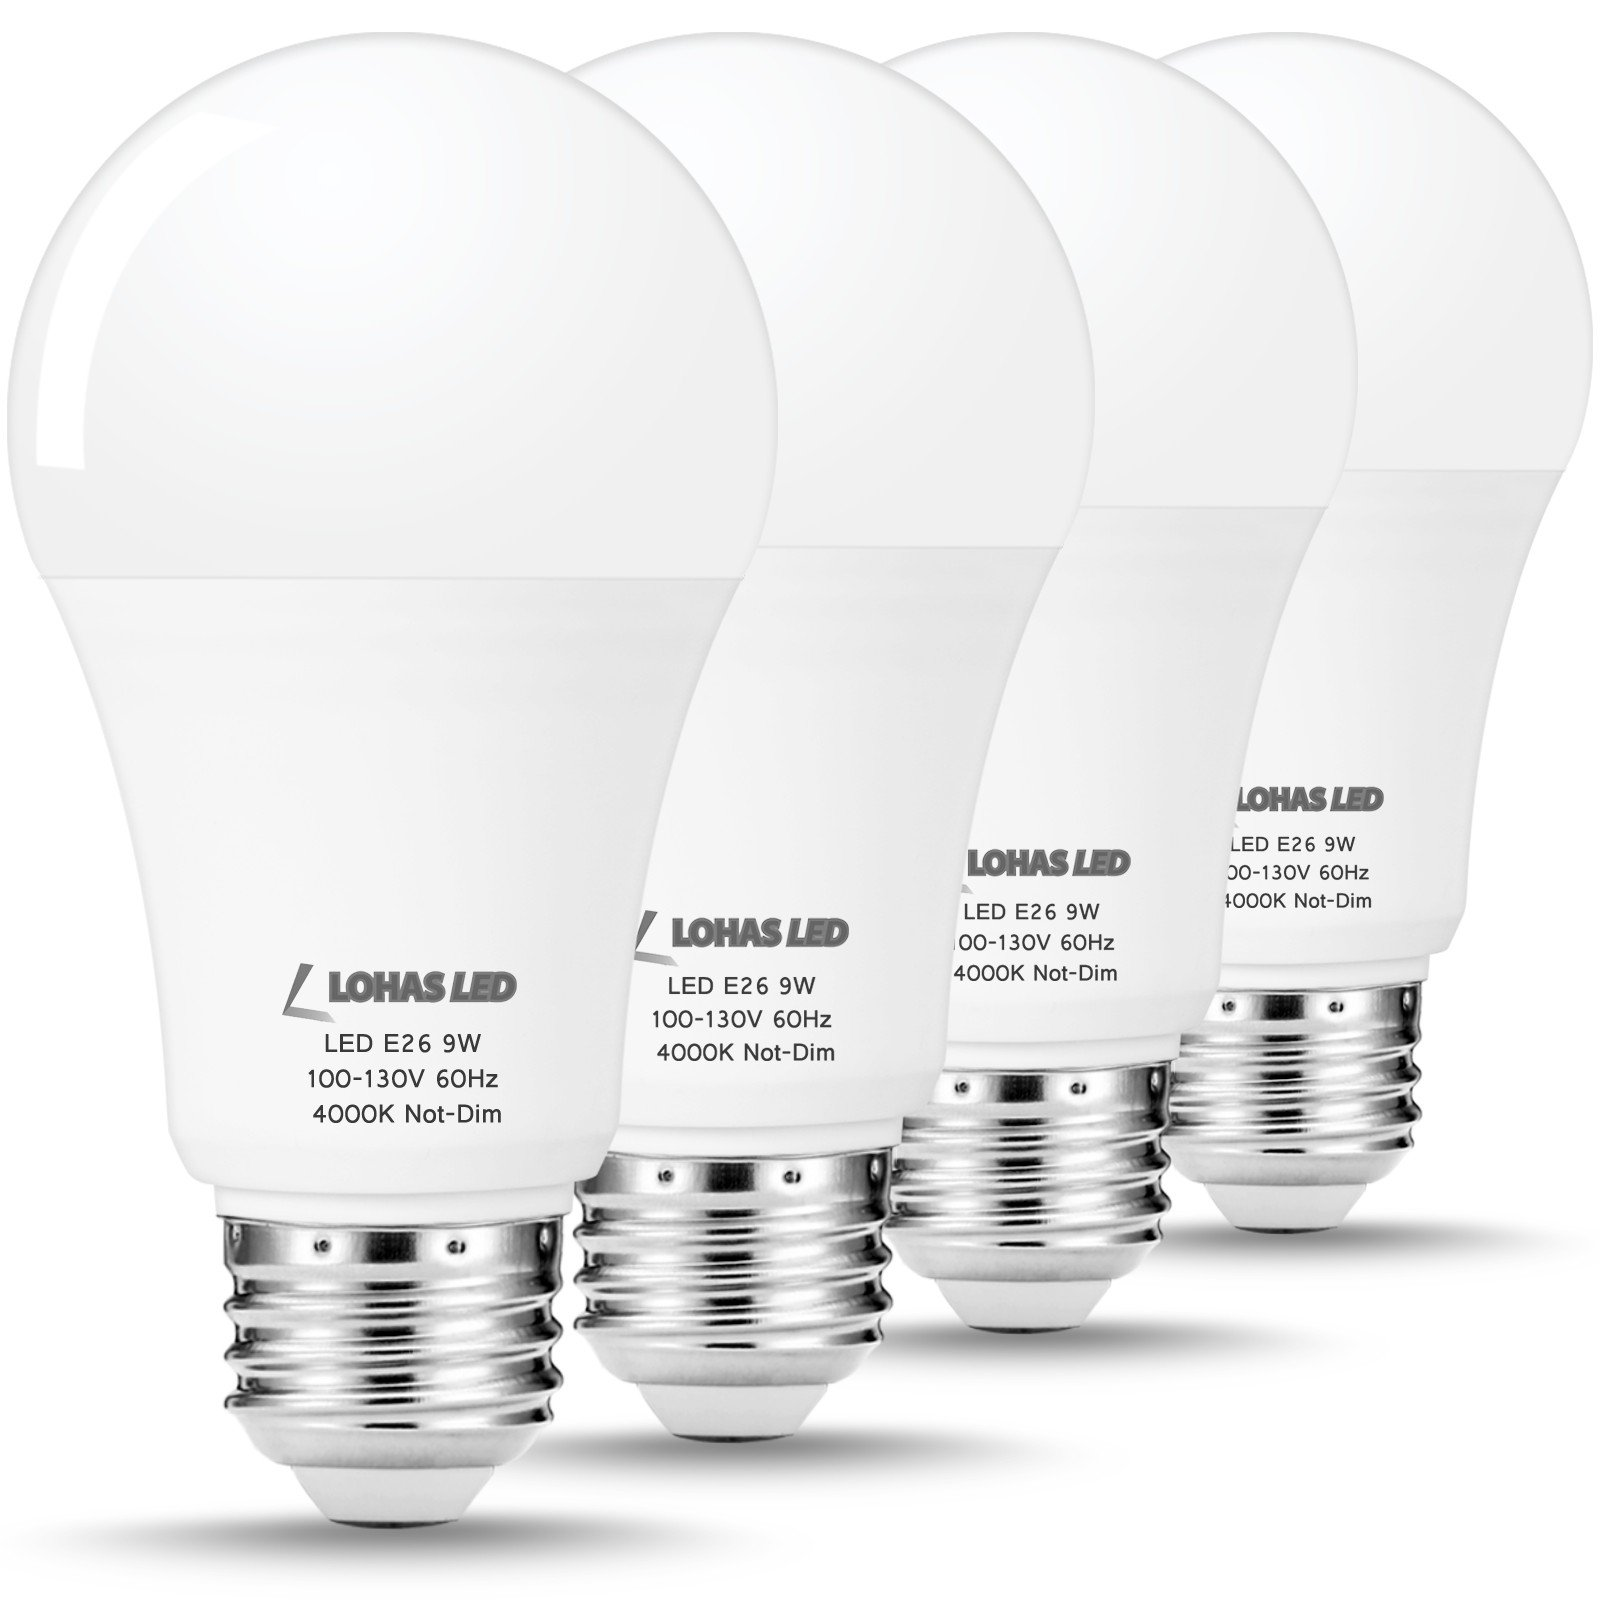 LOHAS A19 4000K LED Bulb, 60W Equivalent(9W LED), E26 Medium Screw Base, Natural Daylight Light Bulbs, Not Dimmable, 800 Lumens, Energy Saving Lighting for Restroom, Kitchen Lamp(4 PACK)